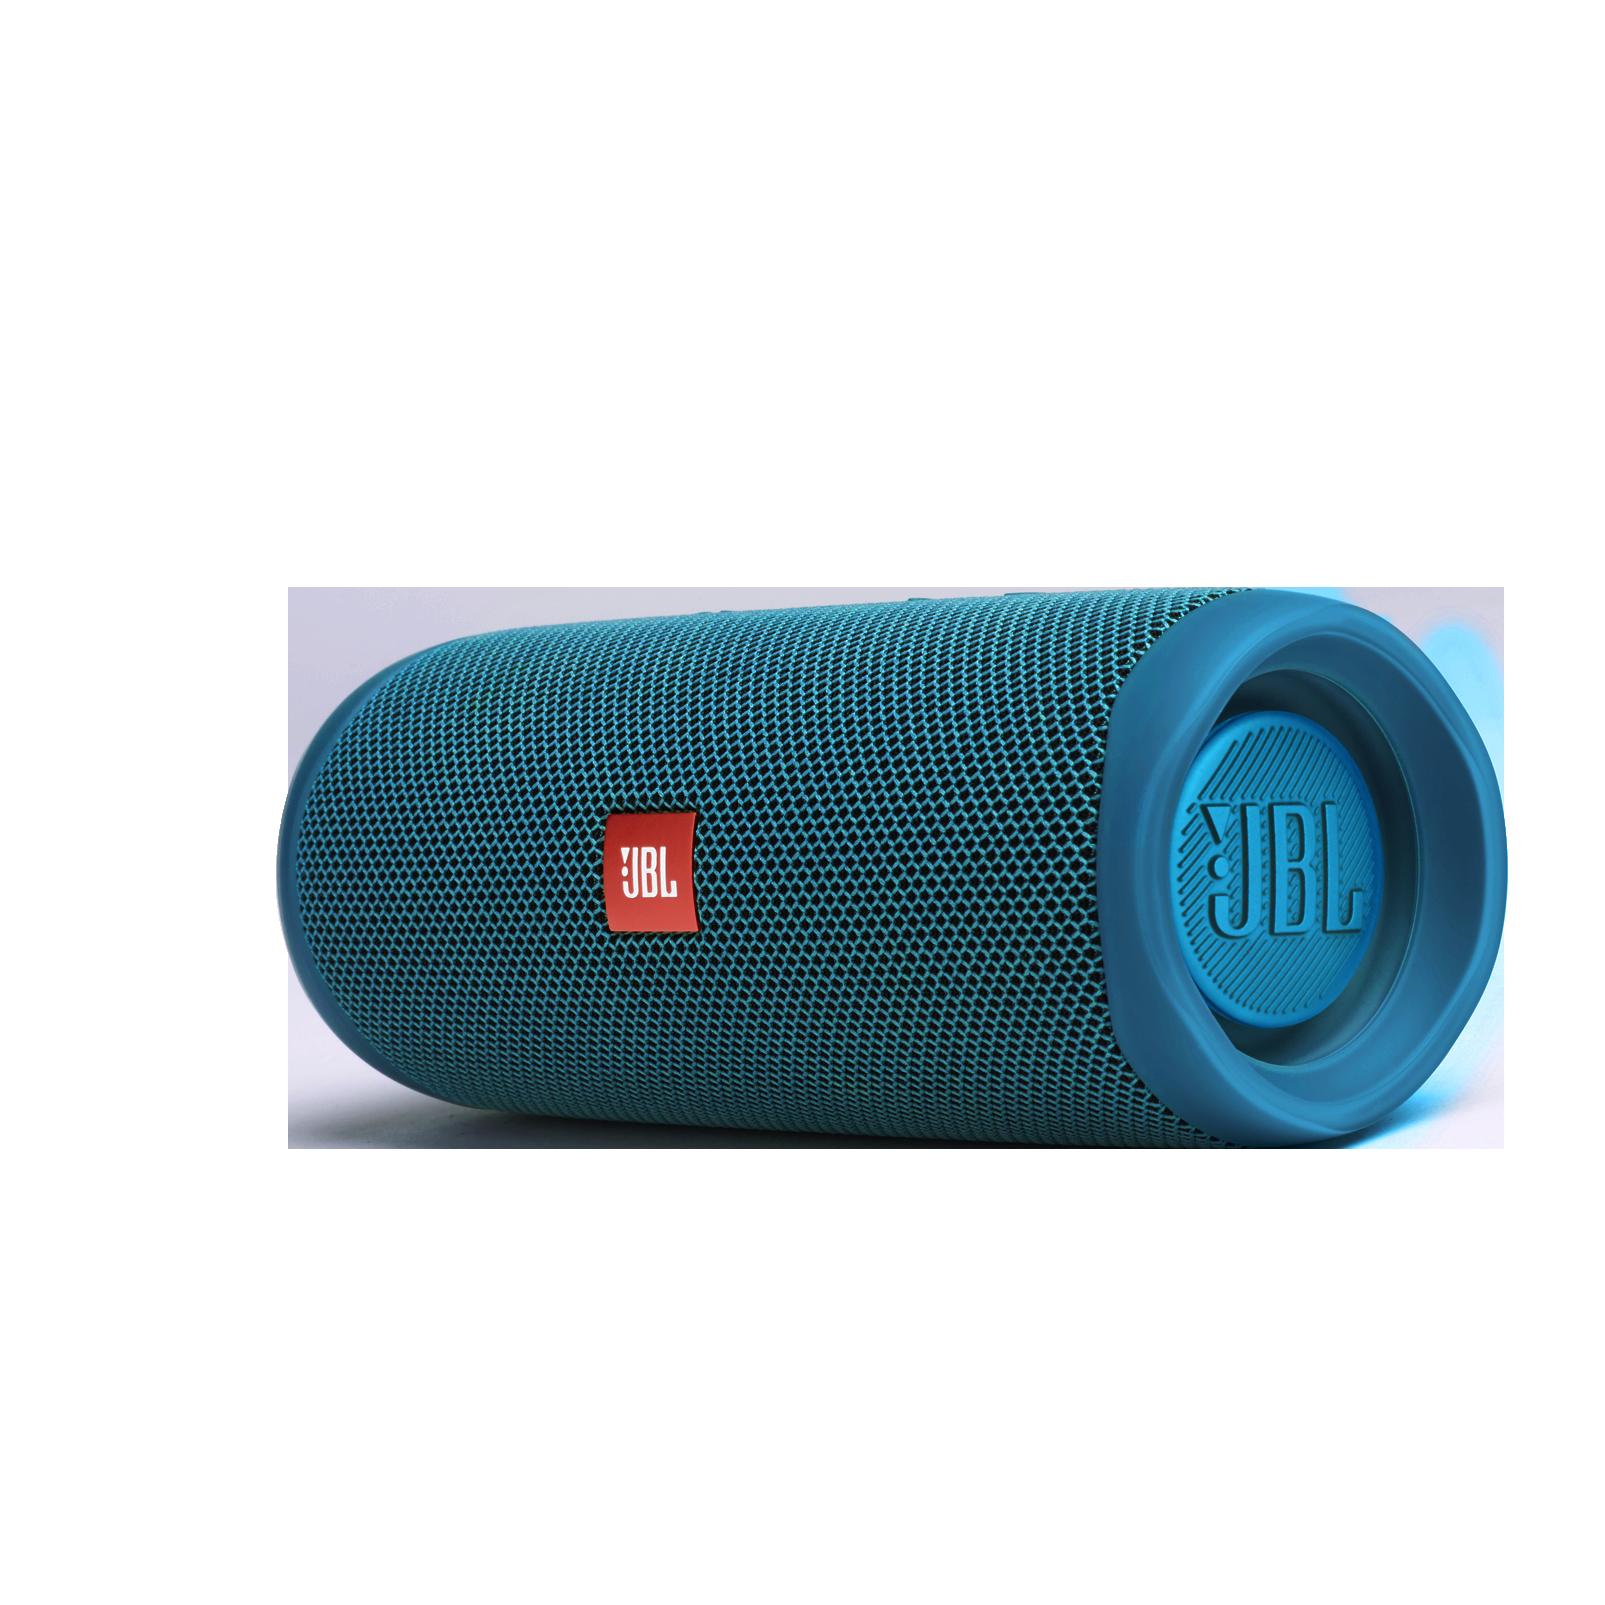 JBL Flip 5 Eco edition - Ocean Blue - Portable Speaker - Eco edition - Left